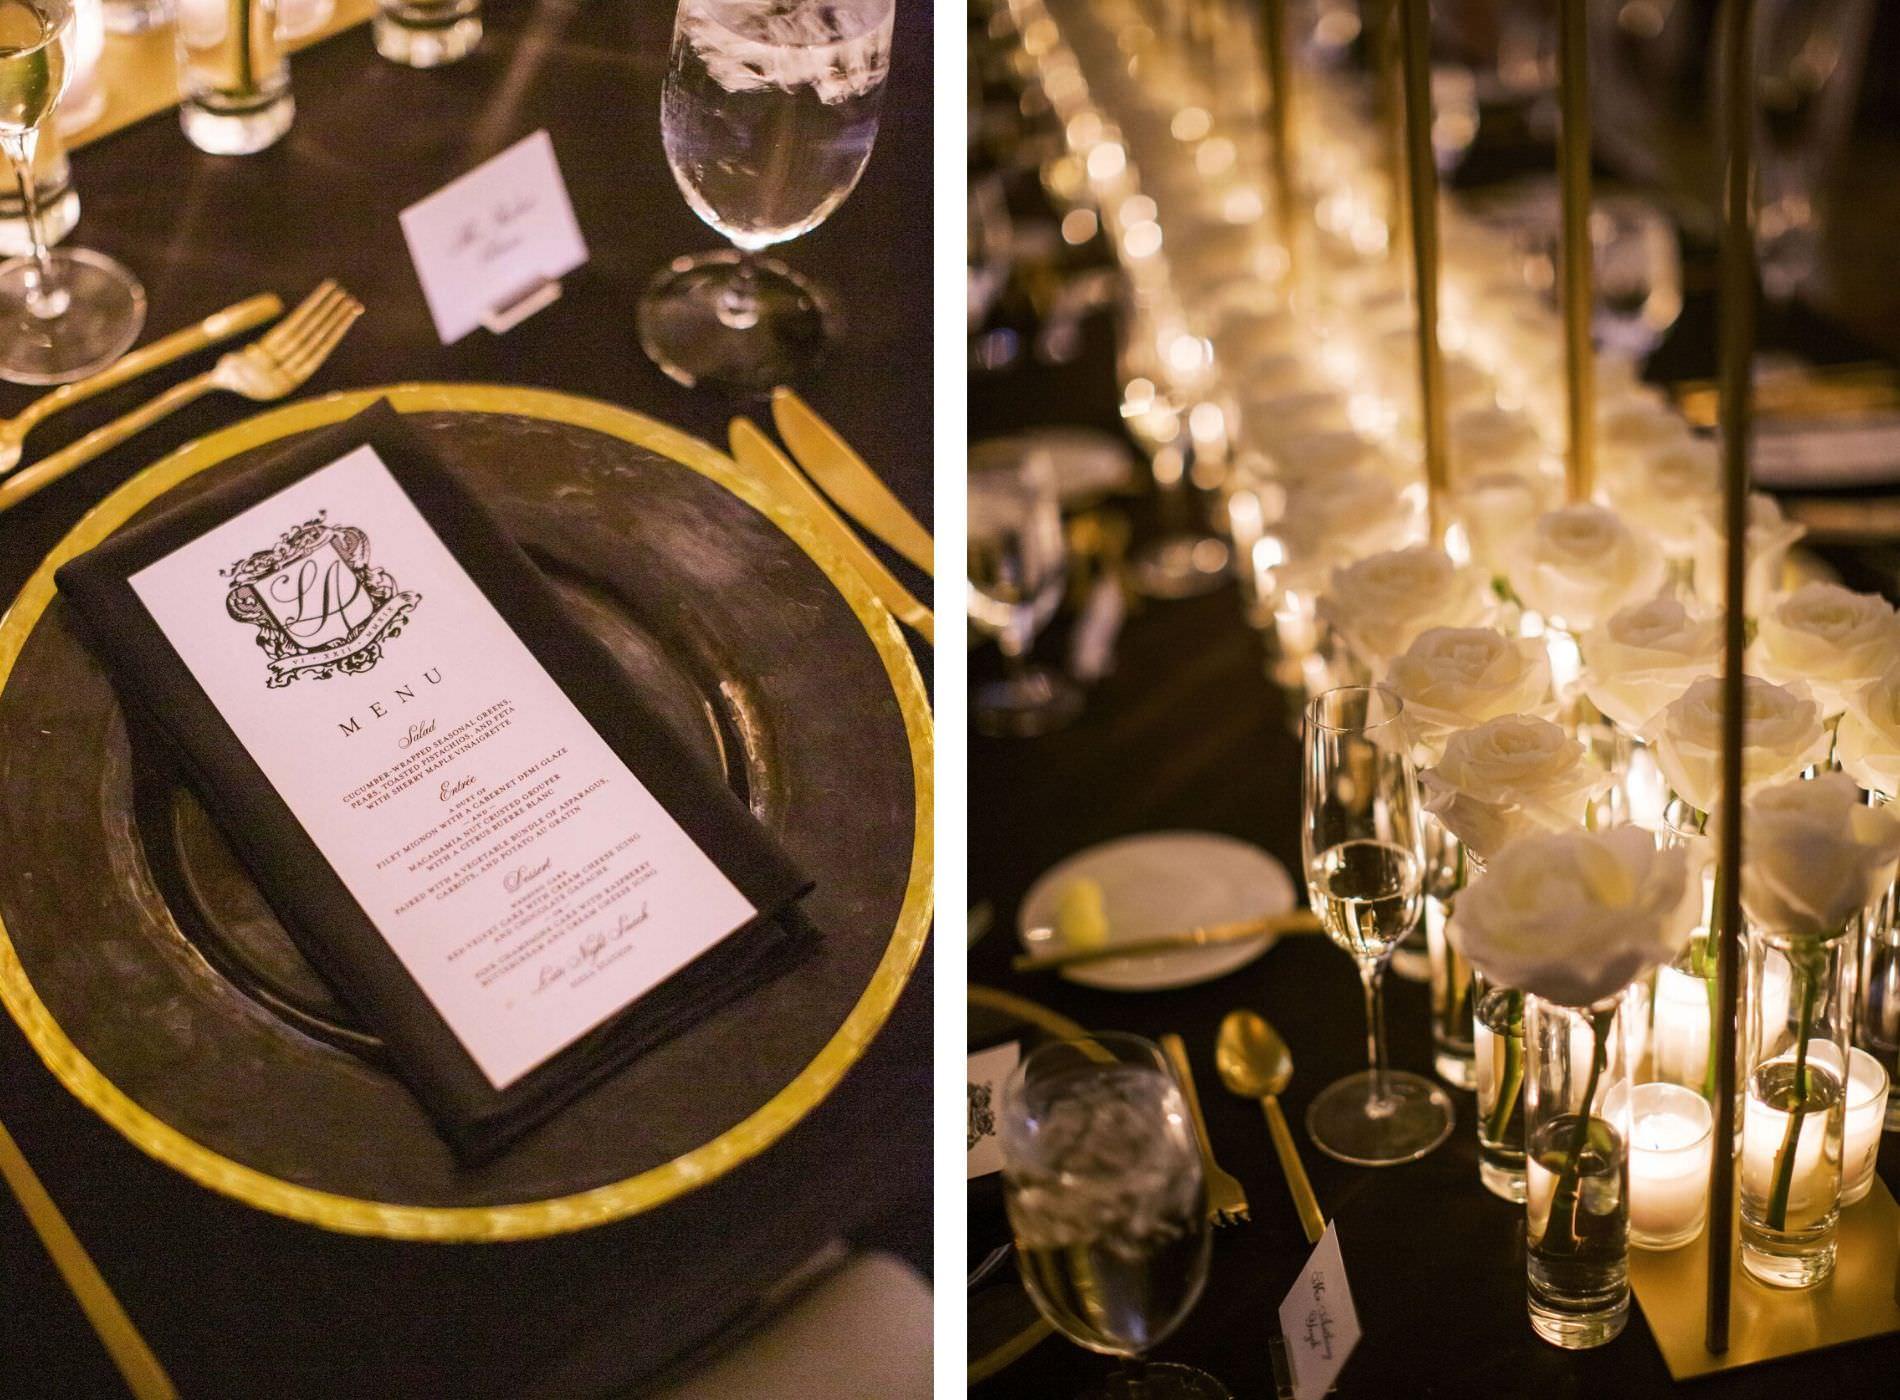 Classic Timeless Elegant Wedding Reception Decor, Gold Rimmed Chargers, Black Linen, Custom Monogram Dinner Menu, White Roses in Cylinder Vases | Tampa Bay Wedding Planner Parties A'la Carte